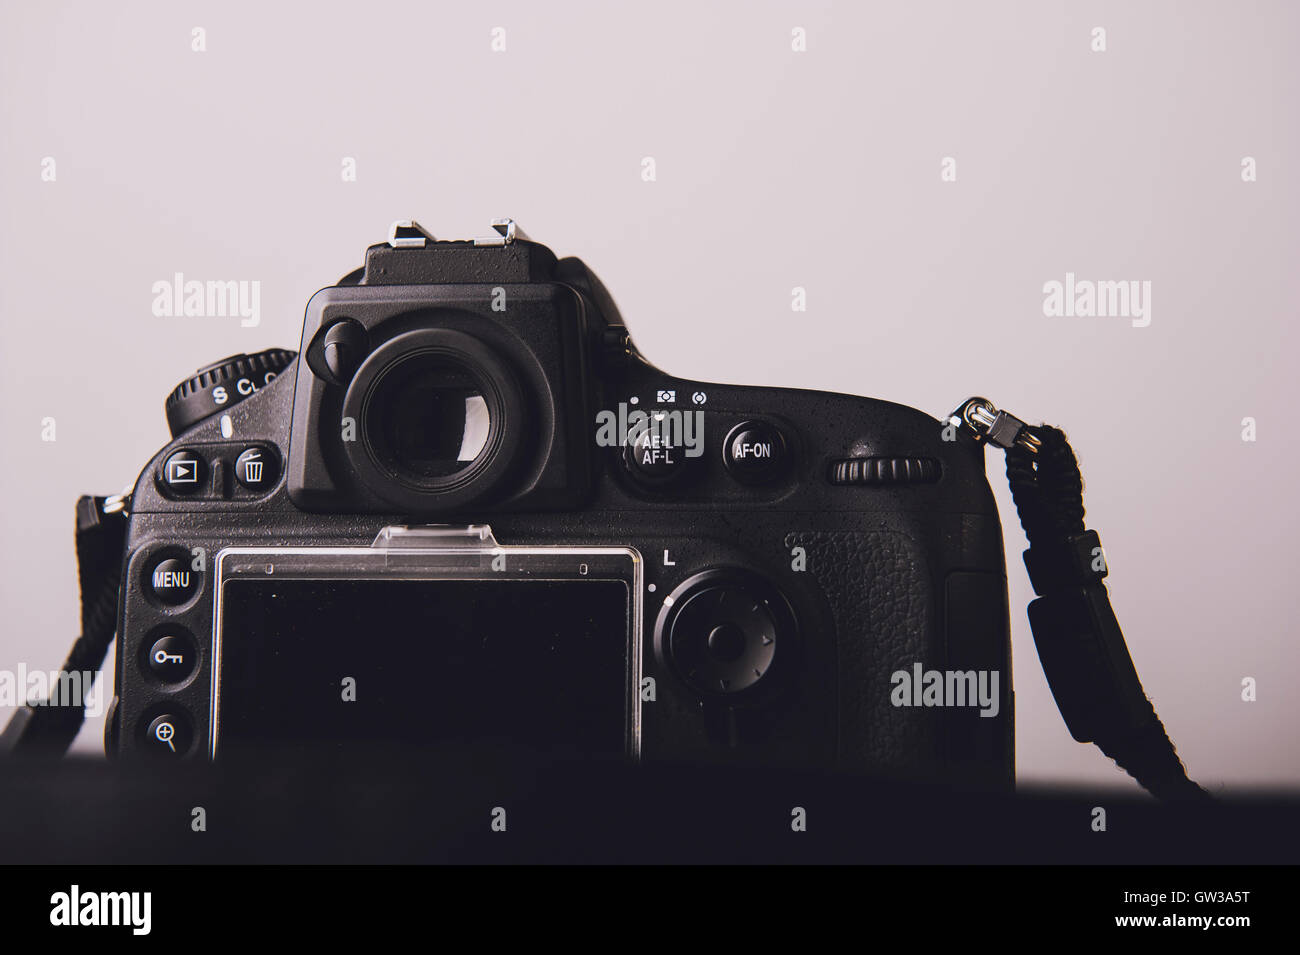 Reflex group shot a clip in 3D format 04/12/2010 52